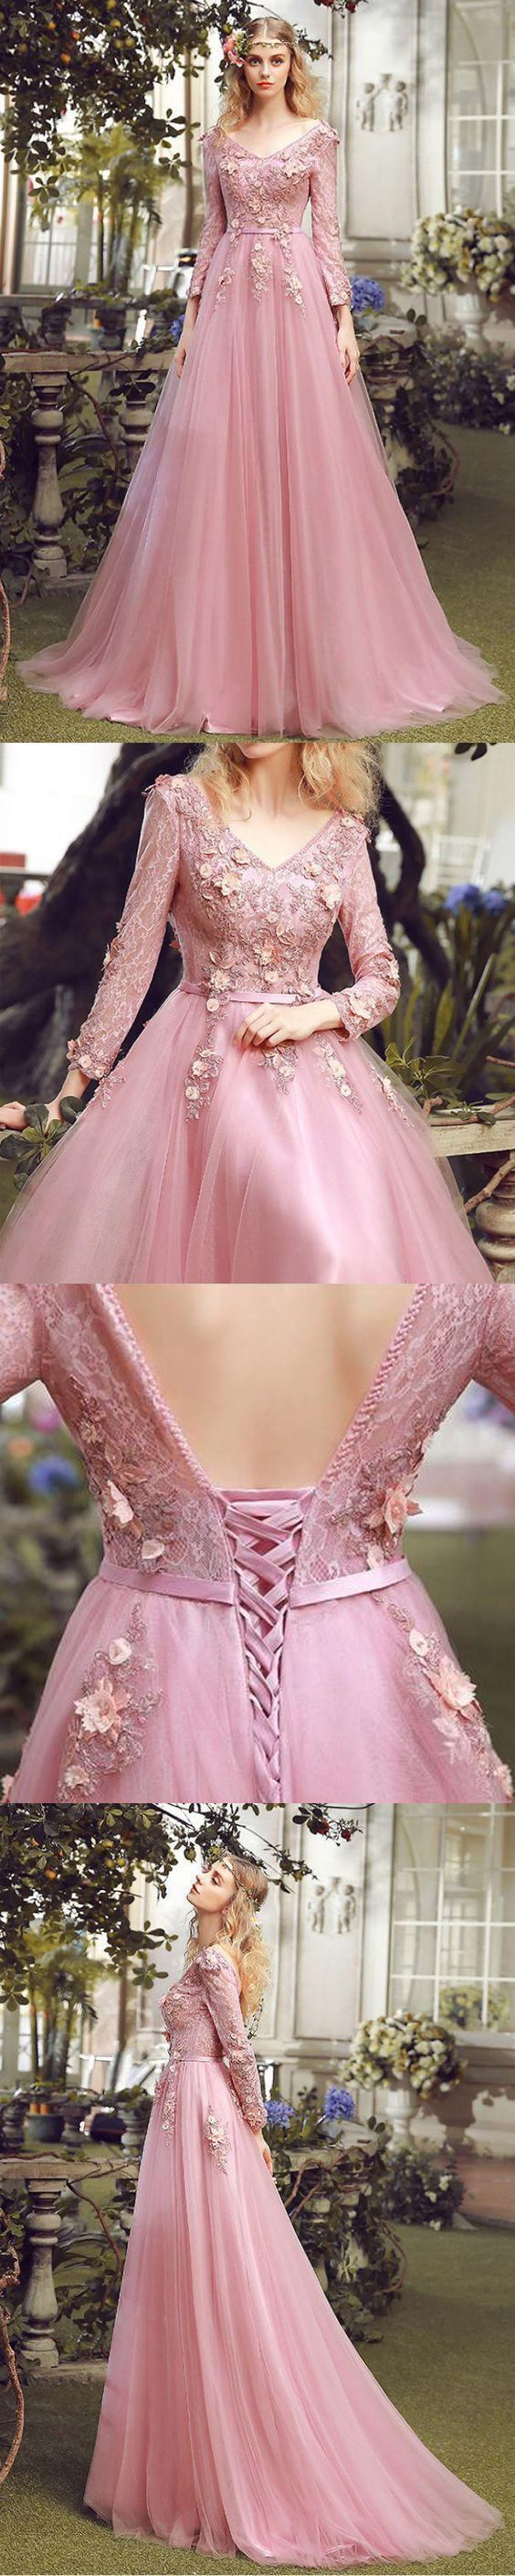 Long Prom Dress, V-Neck Prom Dress, Tulle Prom Dress, A-Line Prom Dress, Long